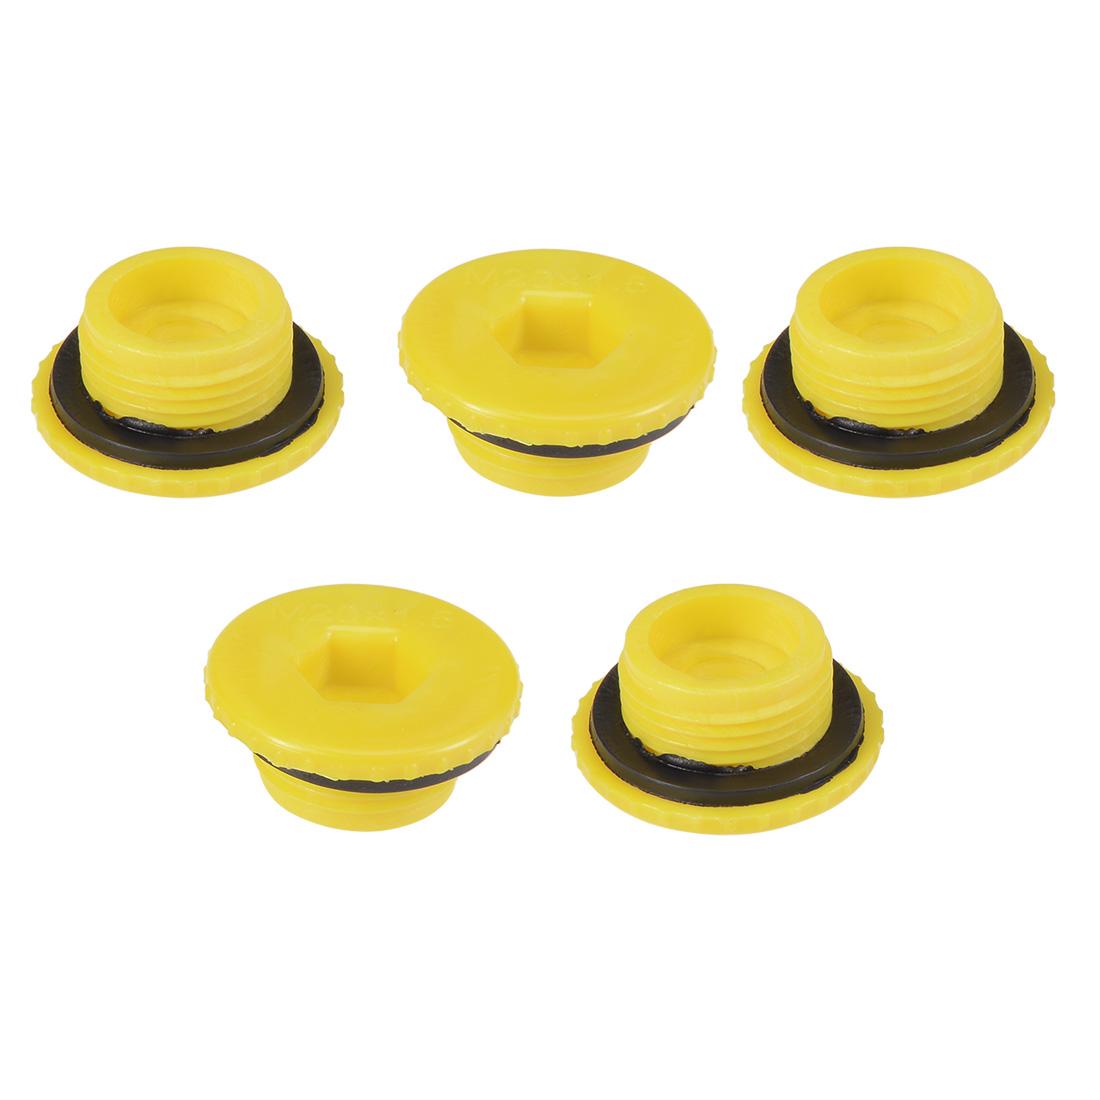 MLD-M20 M20 Hex Socket Design PE Plastic Male Threaded Sealing Cap Yellow 5pcs